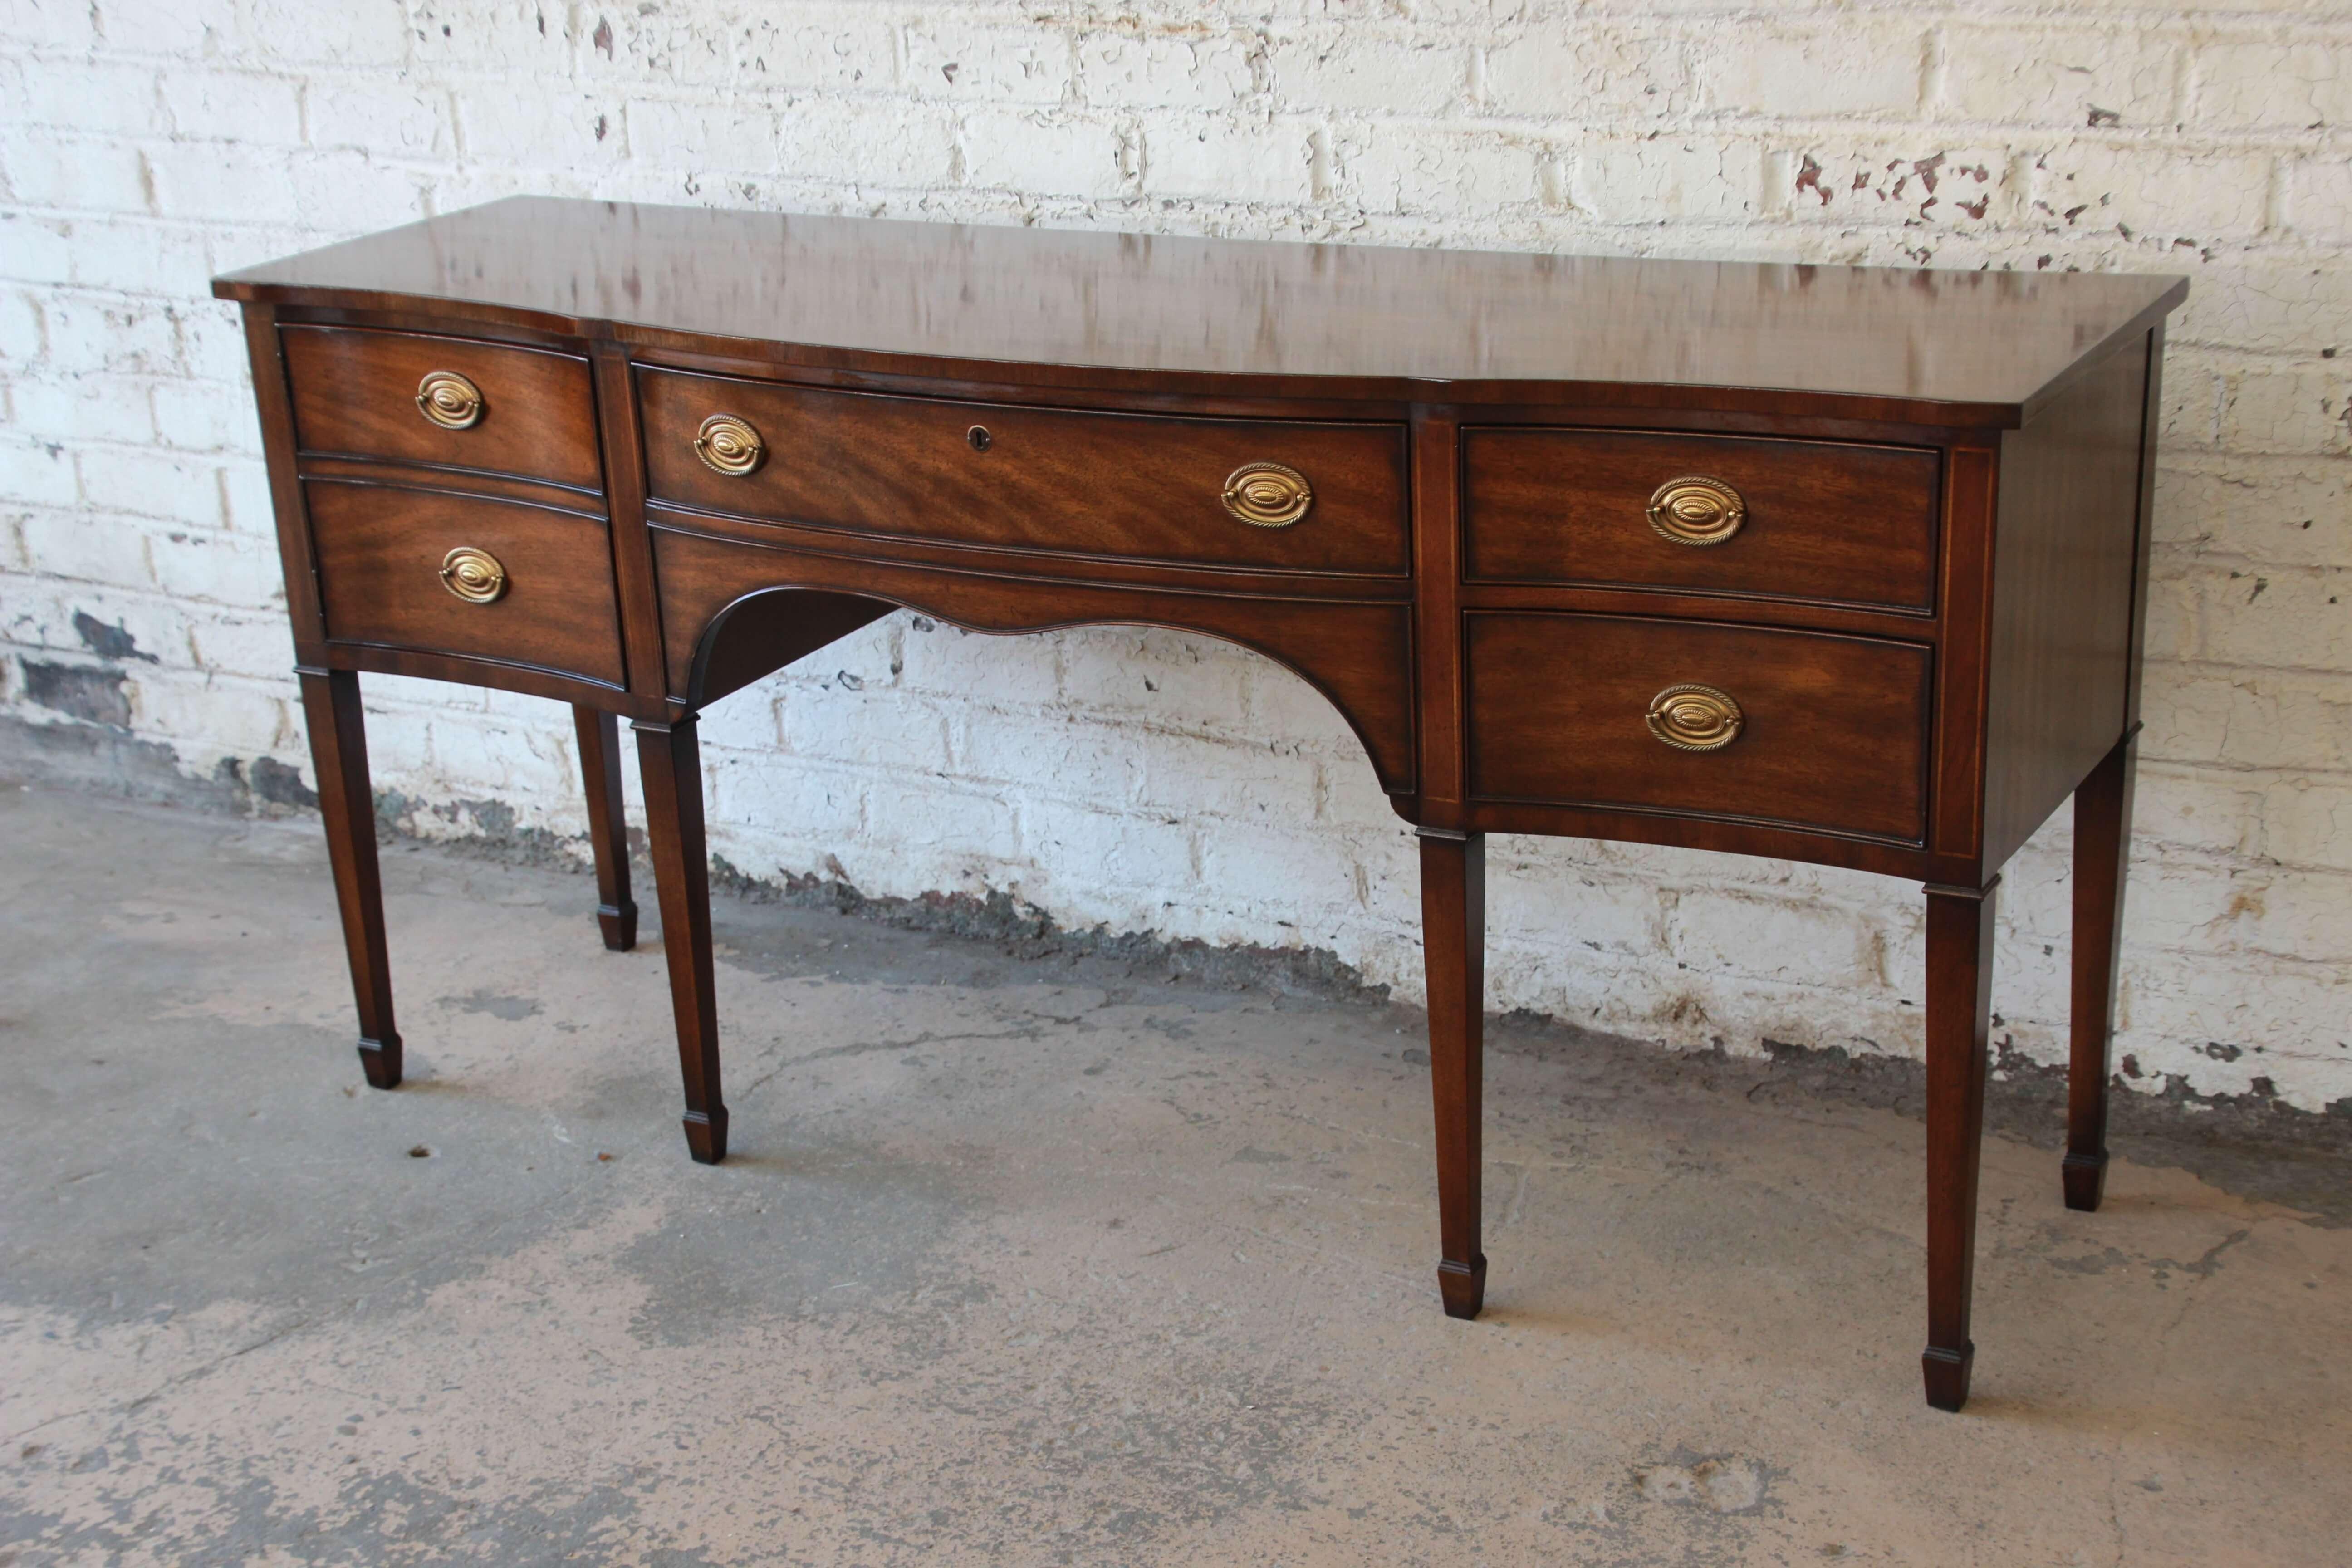 Kindel Furniture Windermere Hepplewhite Style Mahogany Sideboard Credenza